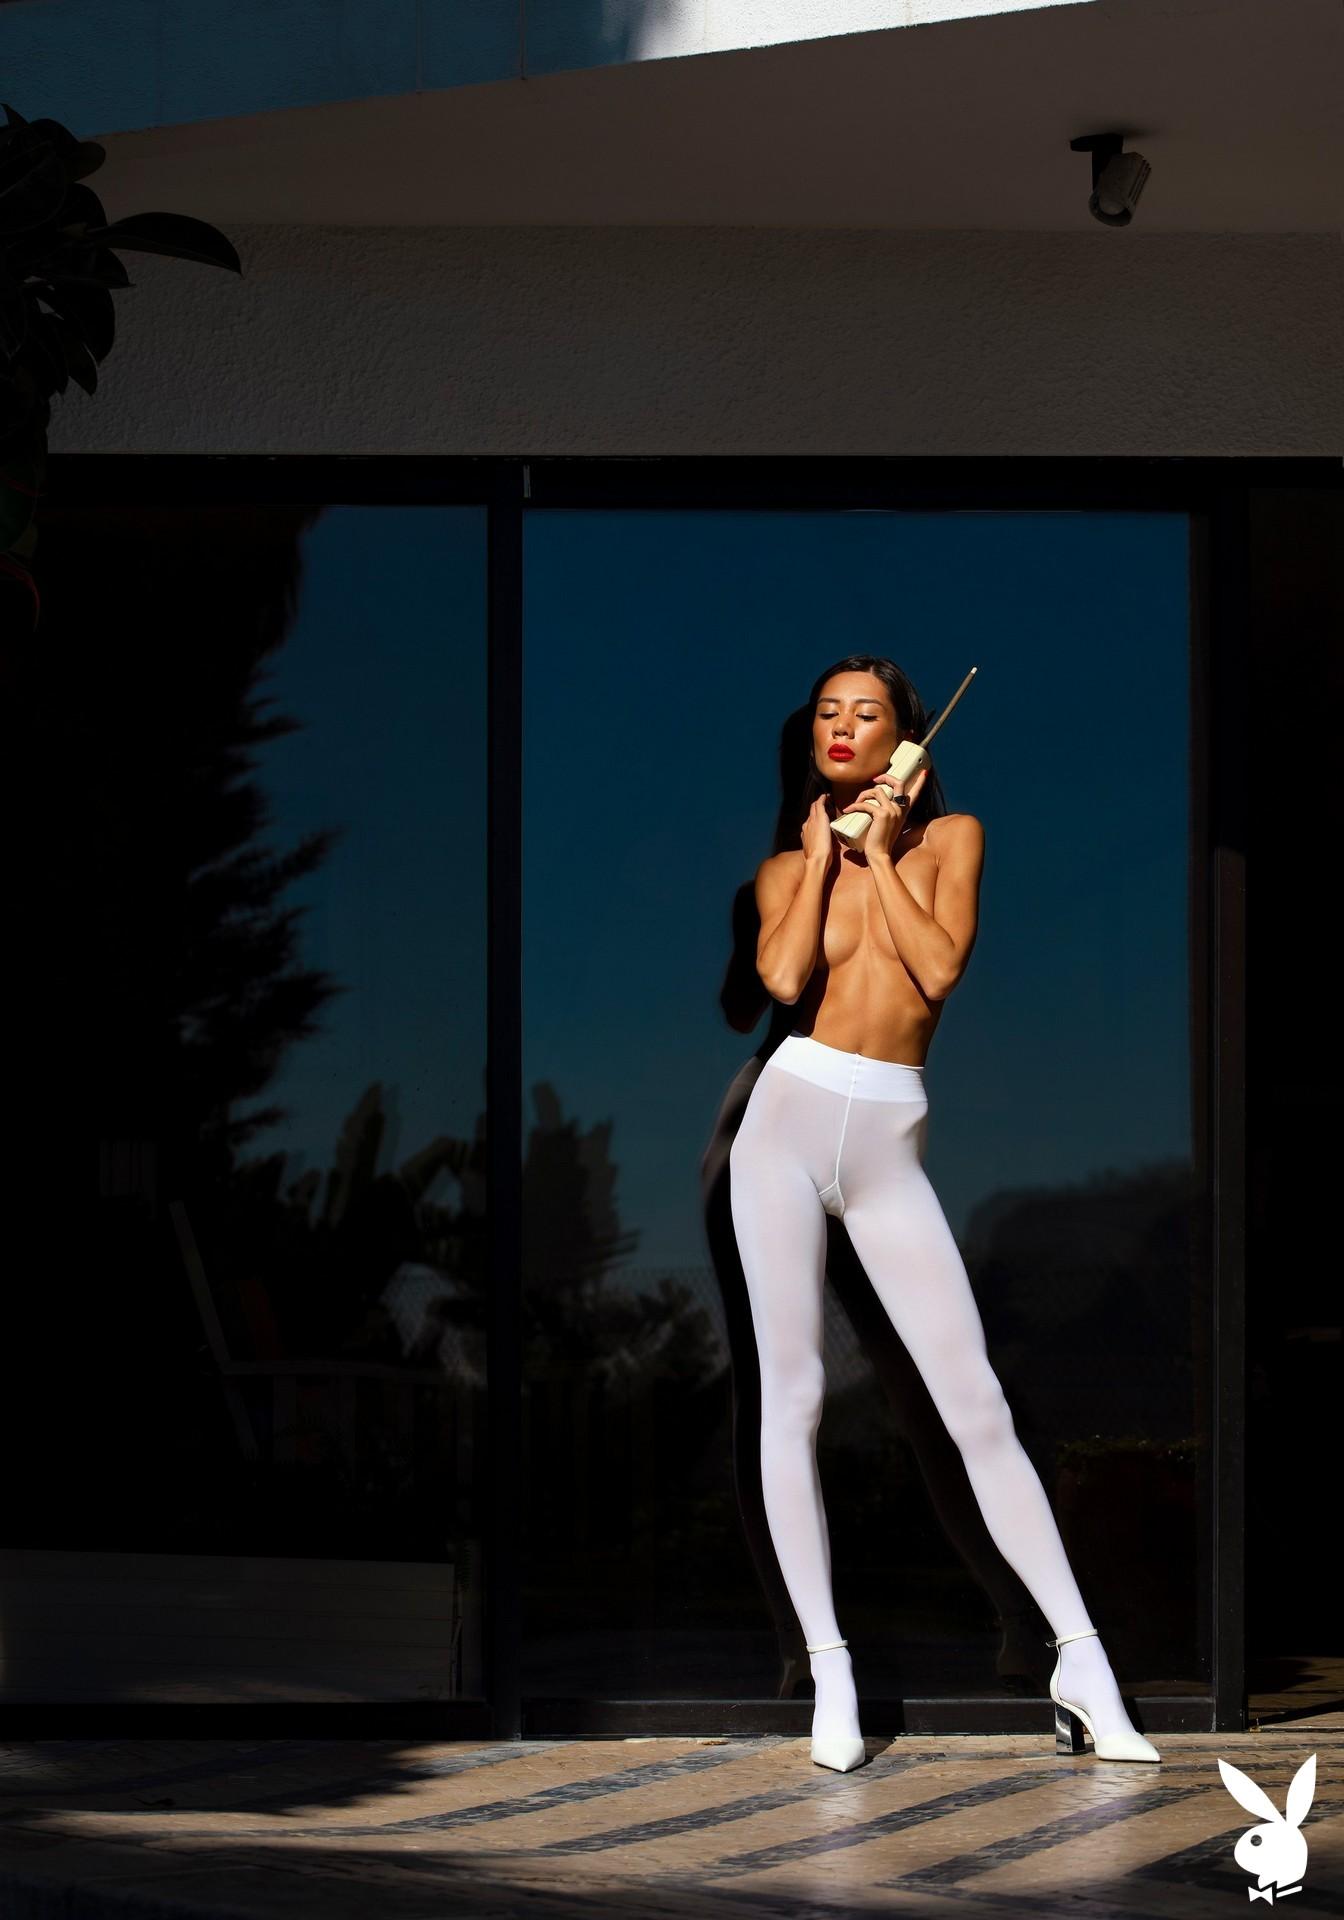 Cledia Fortin For Playboy International Playboy Plus (18)